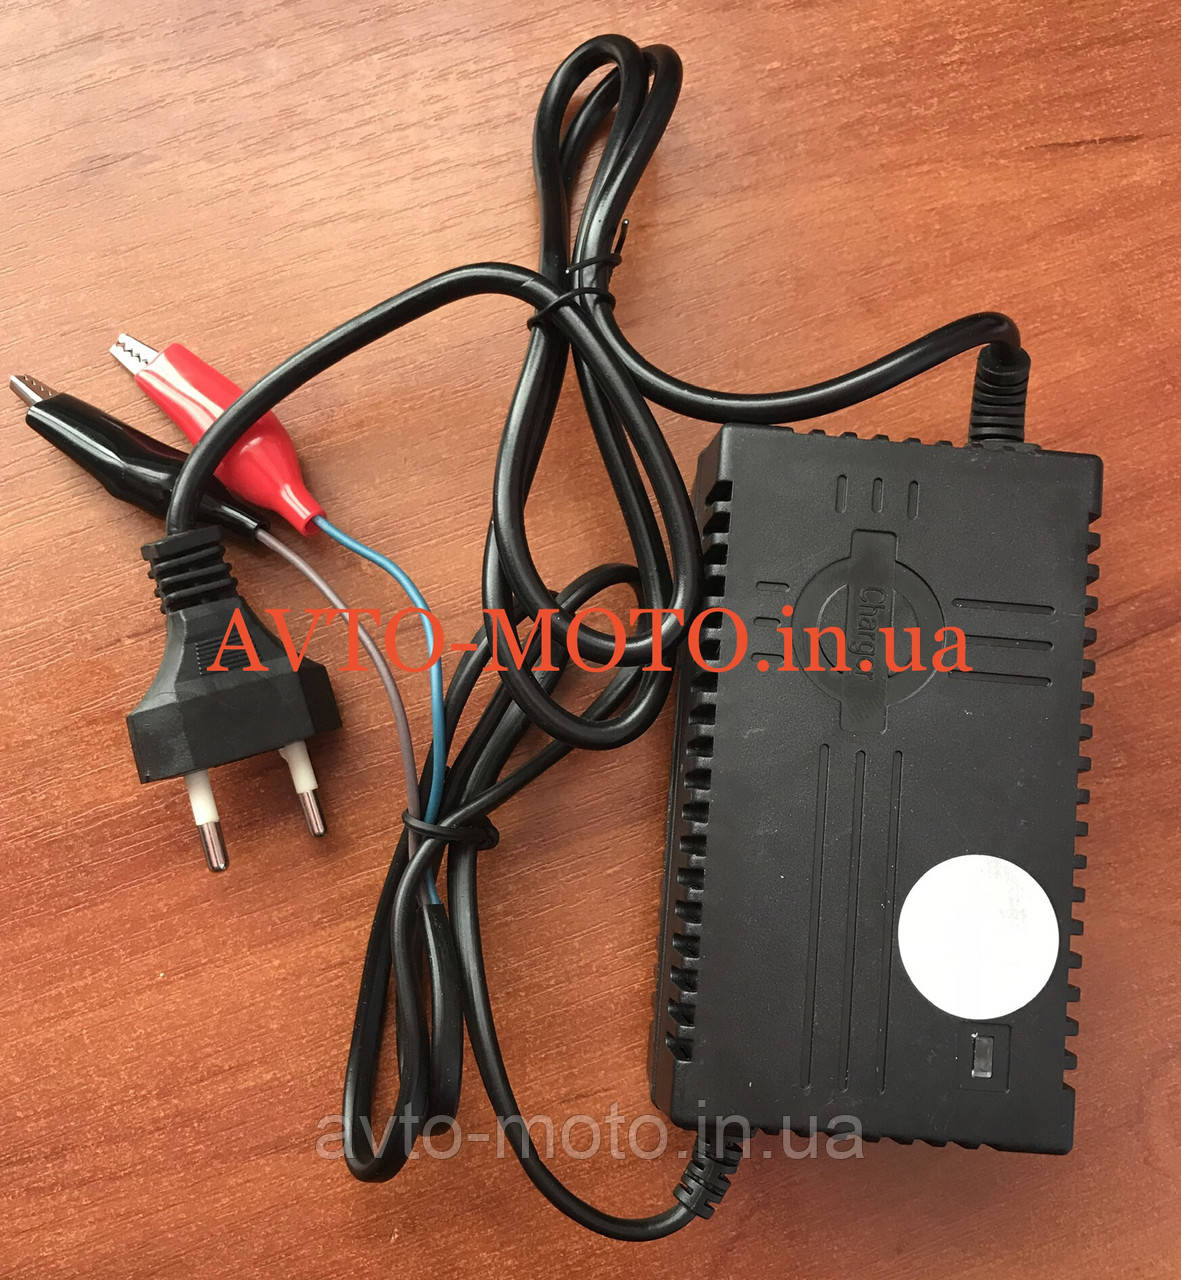 Зарядное устройство аккумулятора 12V1A